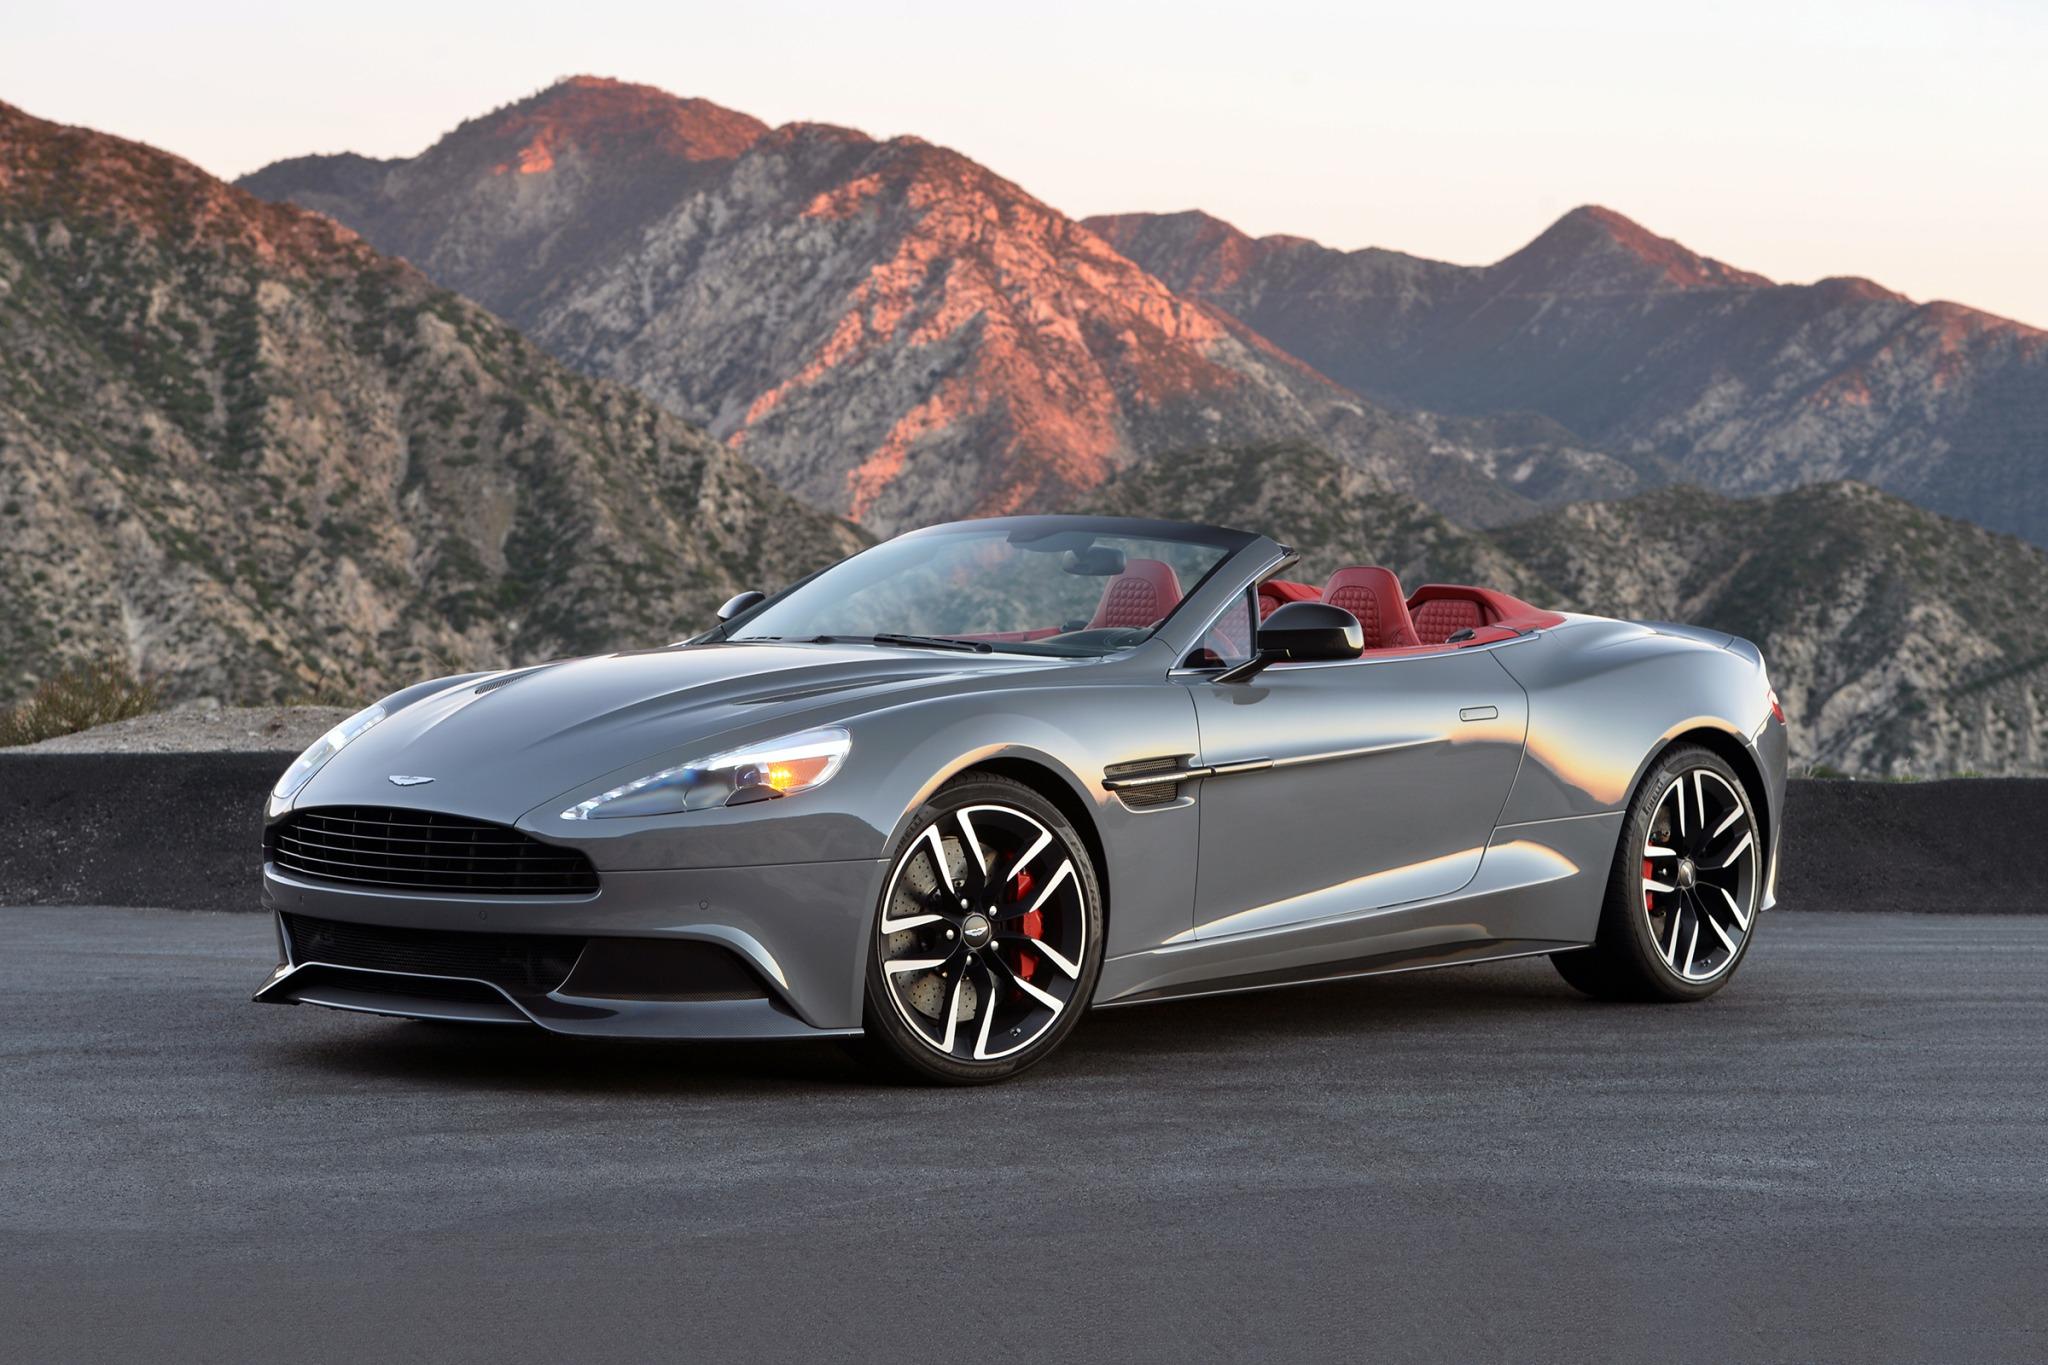 2017 aston martin vanquish convertible volante fq oem 1 2048